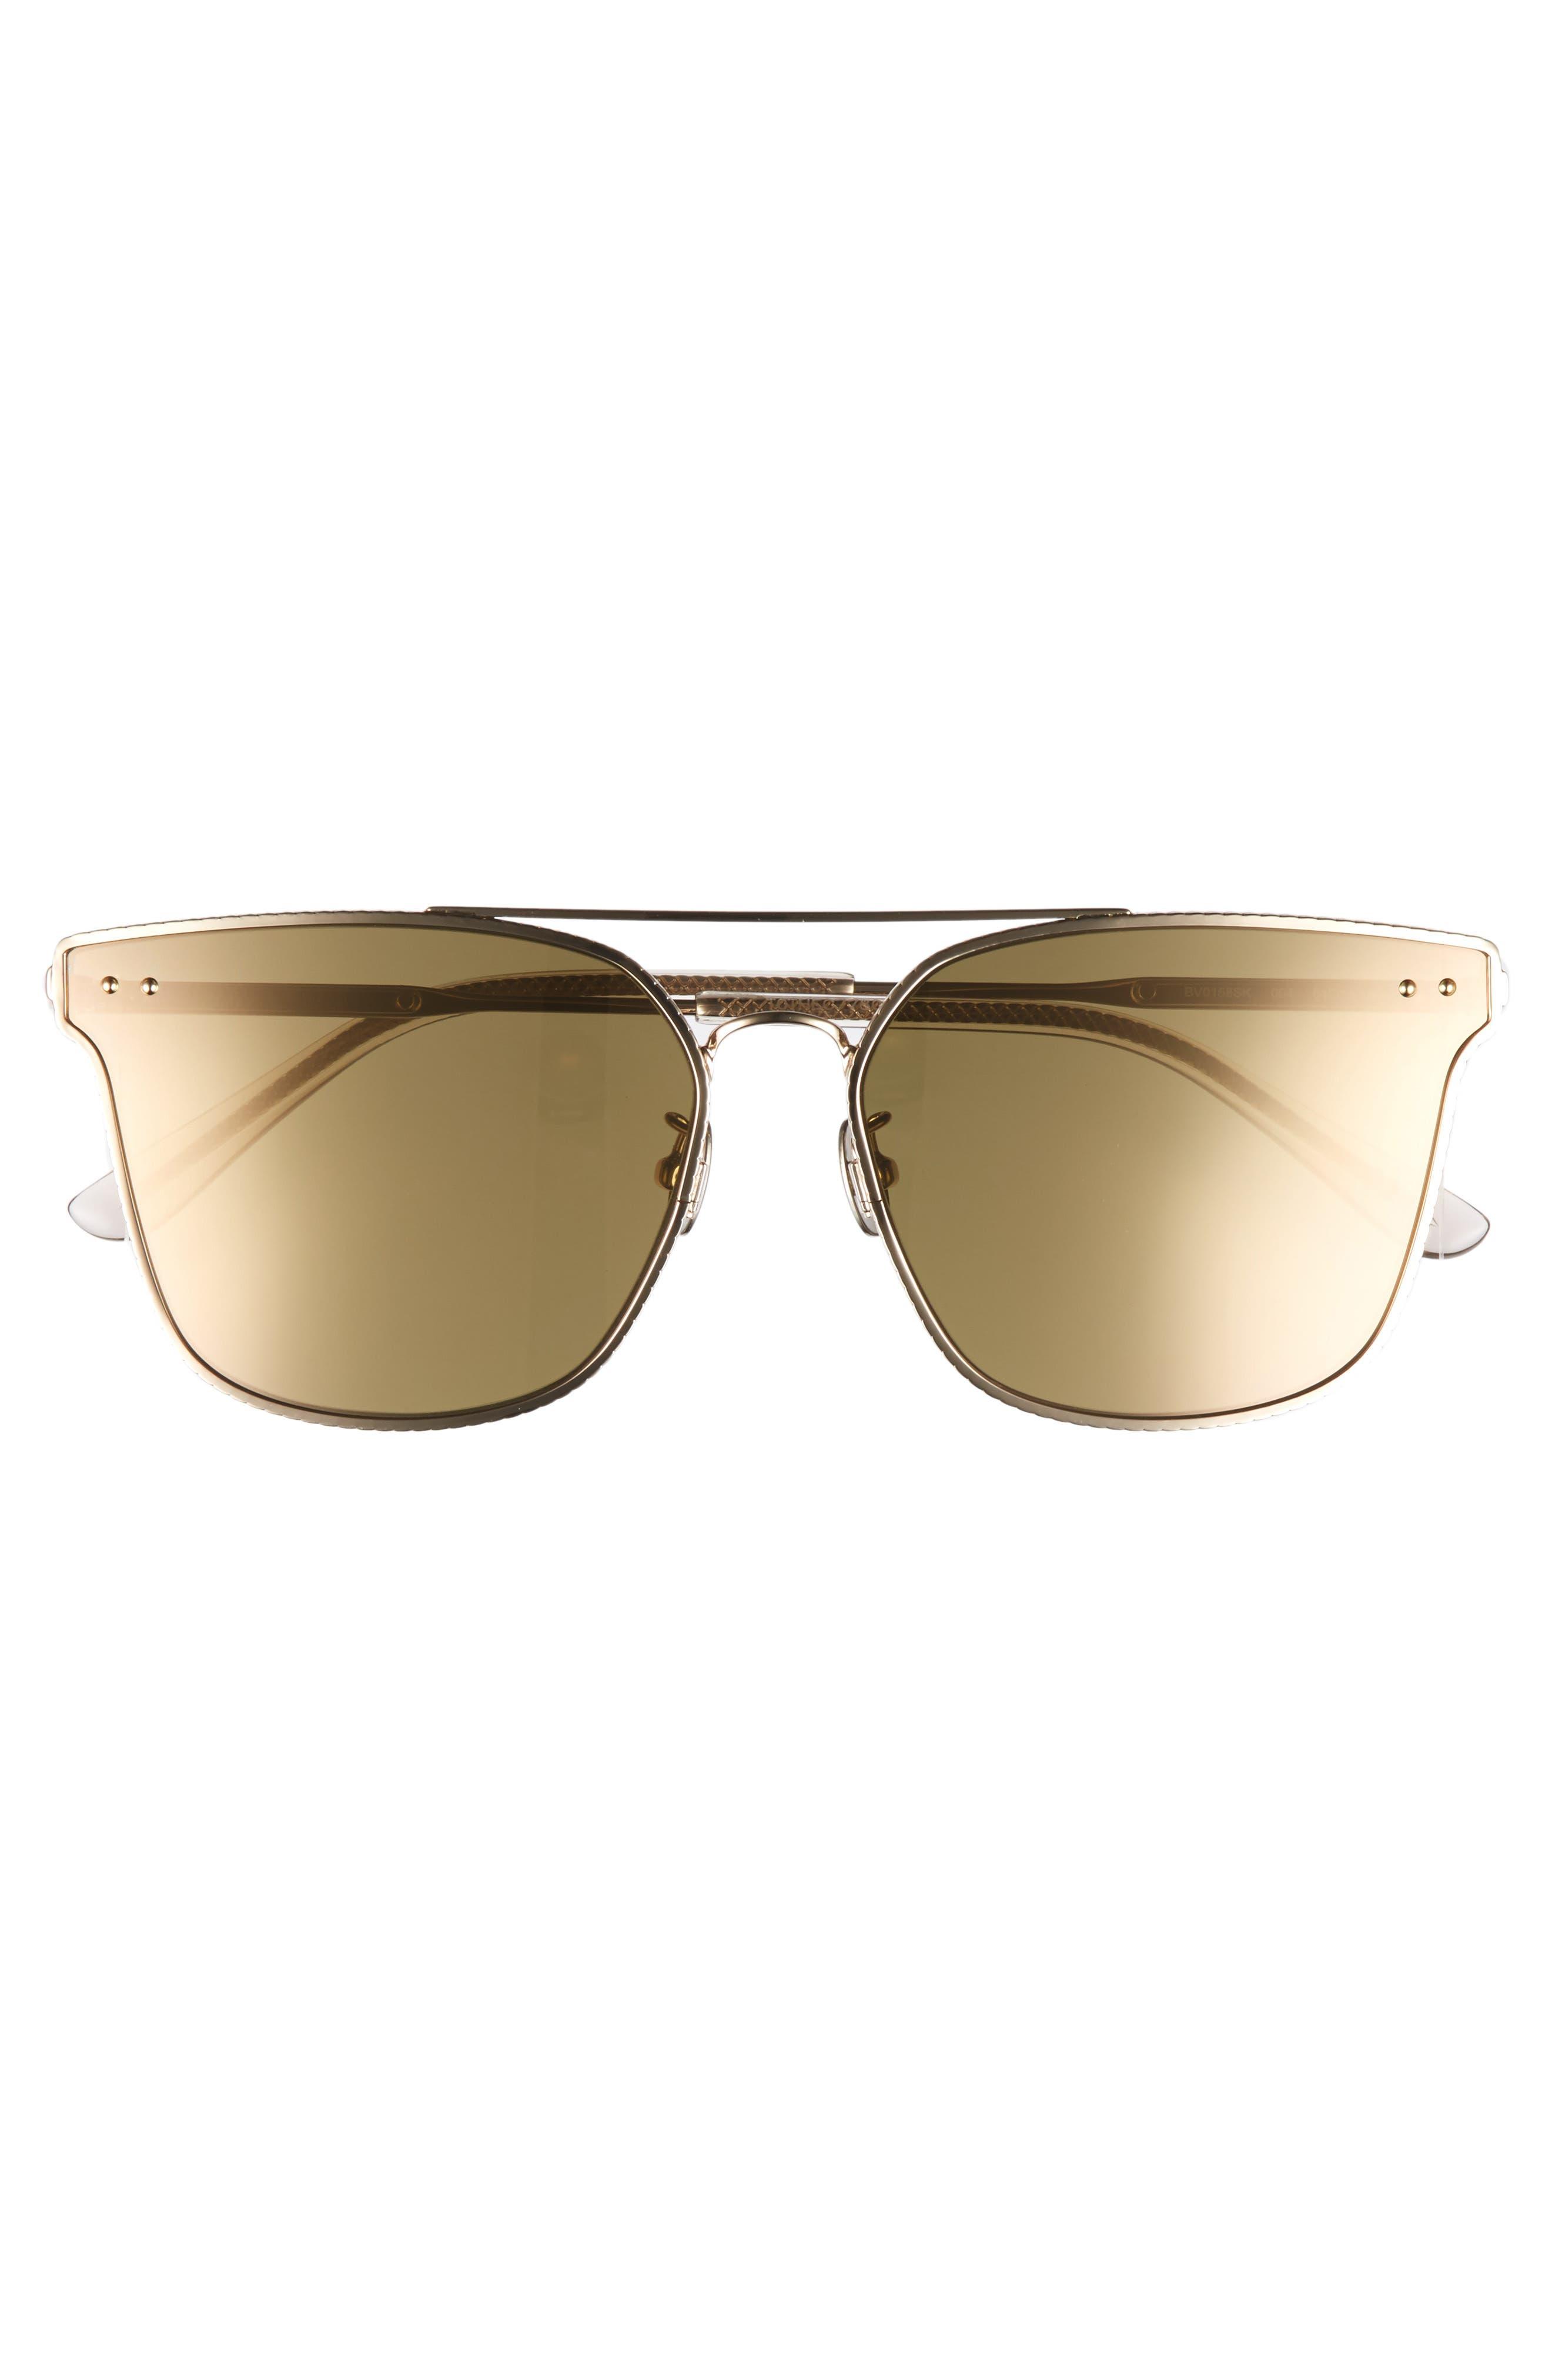 64mm Sunglasses,                             Alternate thumbnail 3, color,                             Gold